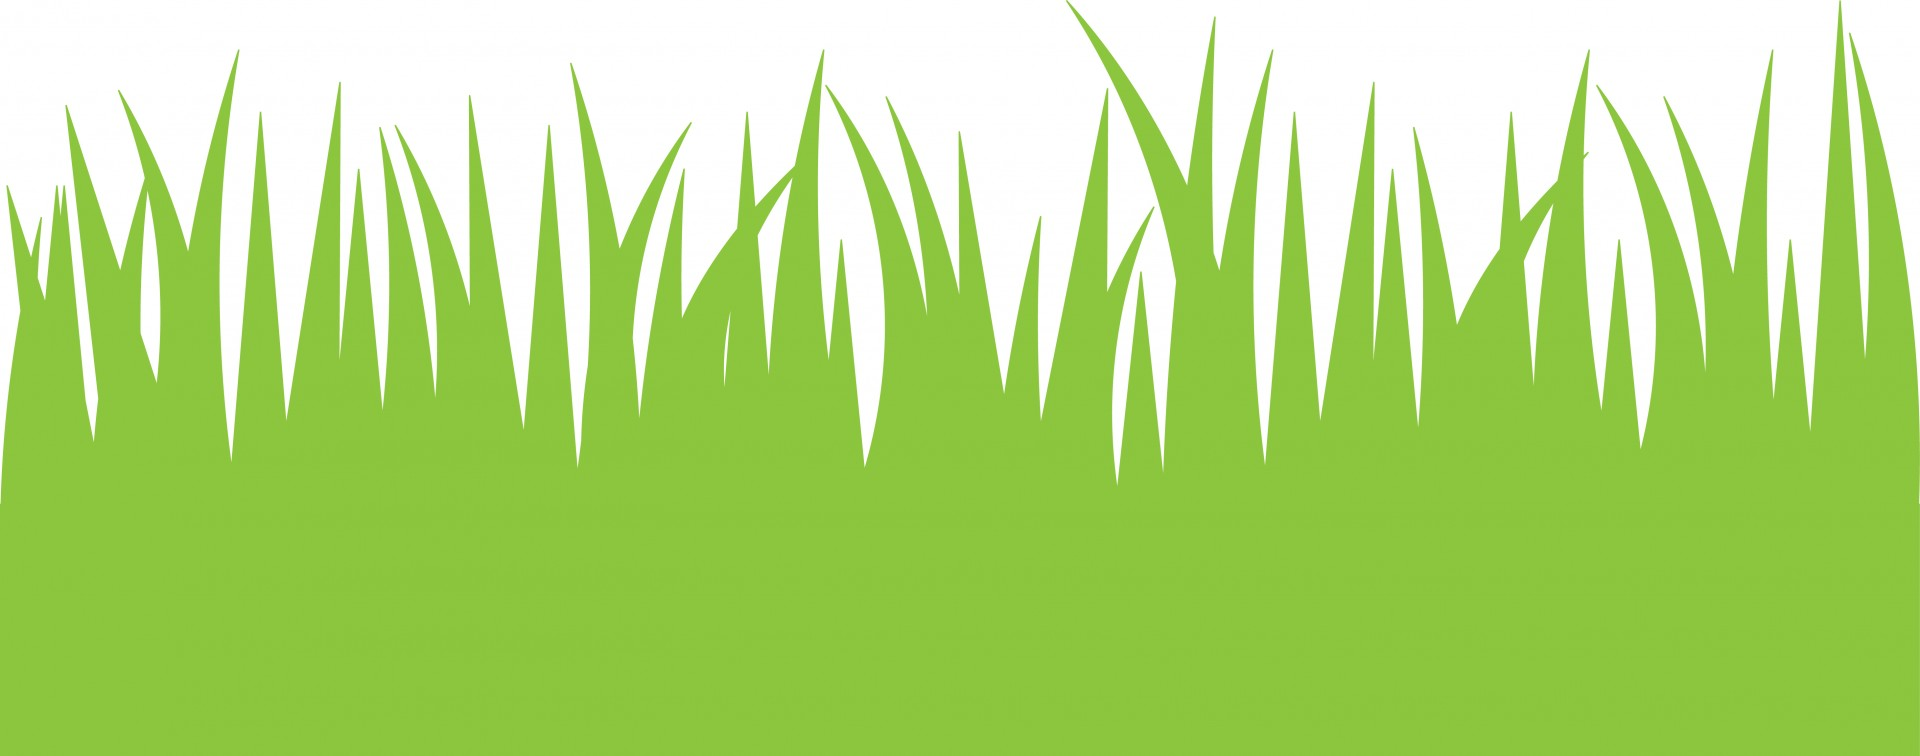 Lawn Clipart-Lawn Clipart-0